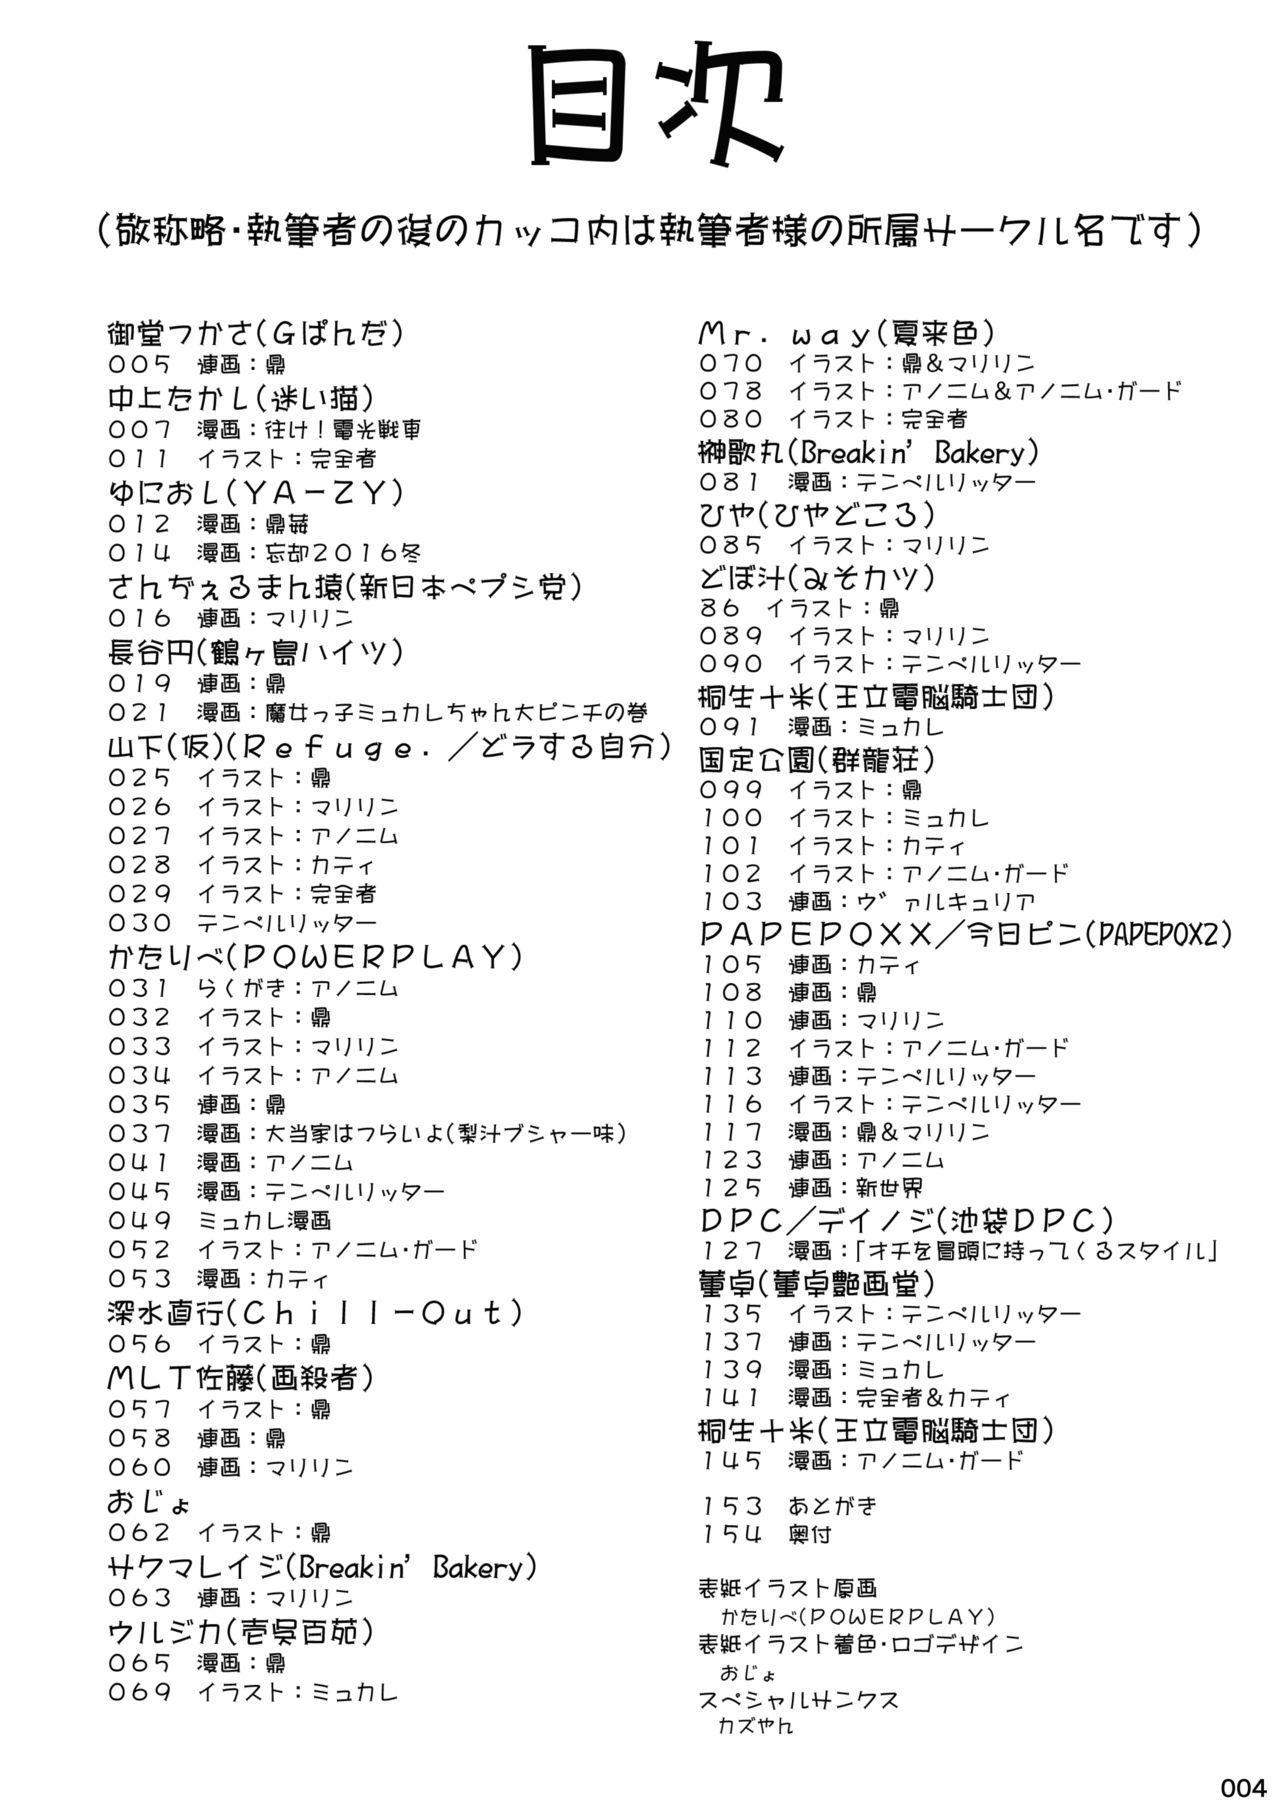 Akatsuki Blitzkampf & EN-1 Perfekt Welt Gangbang Anthology 3